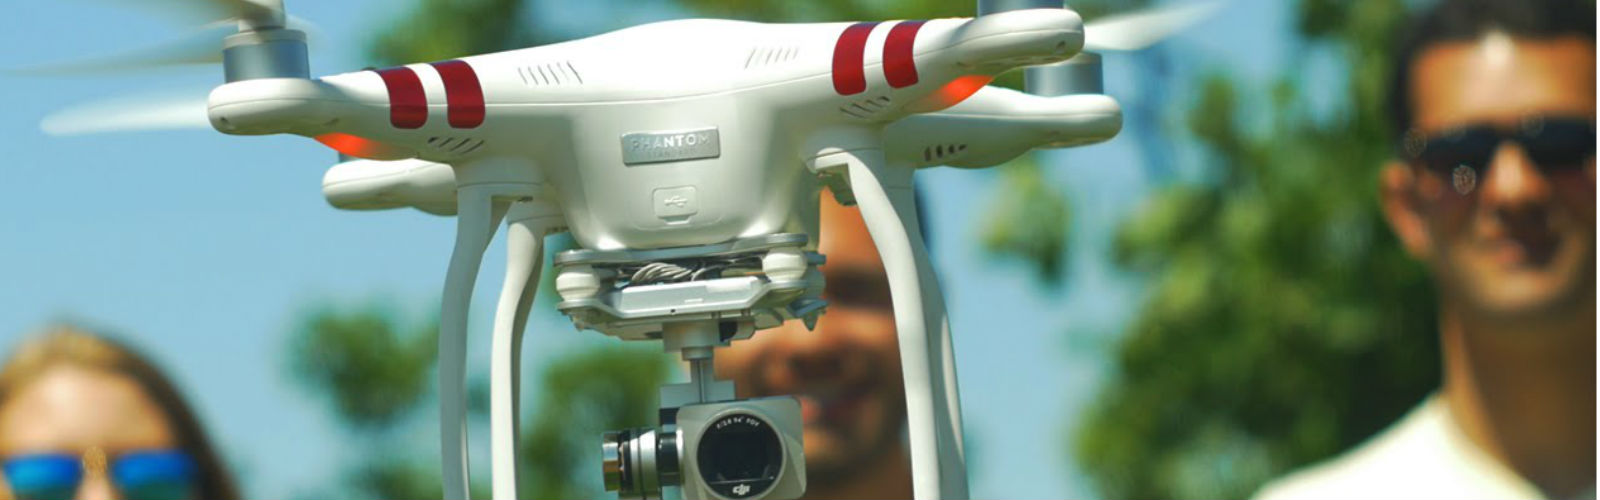 Phantom 3 Standard Drone Makes Your Photography Go Sky High